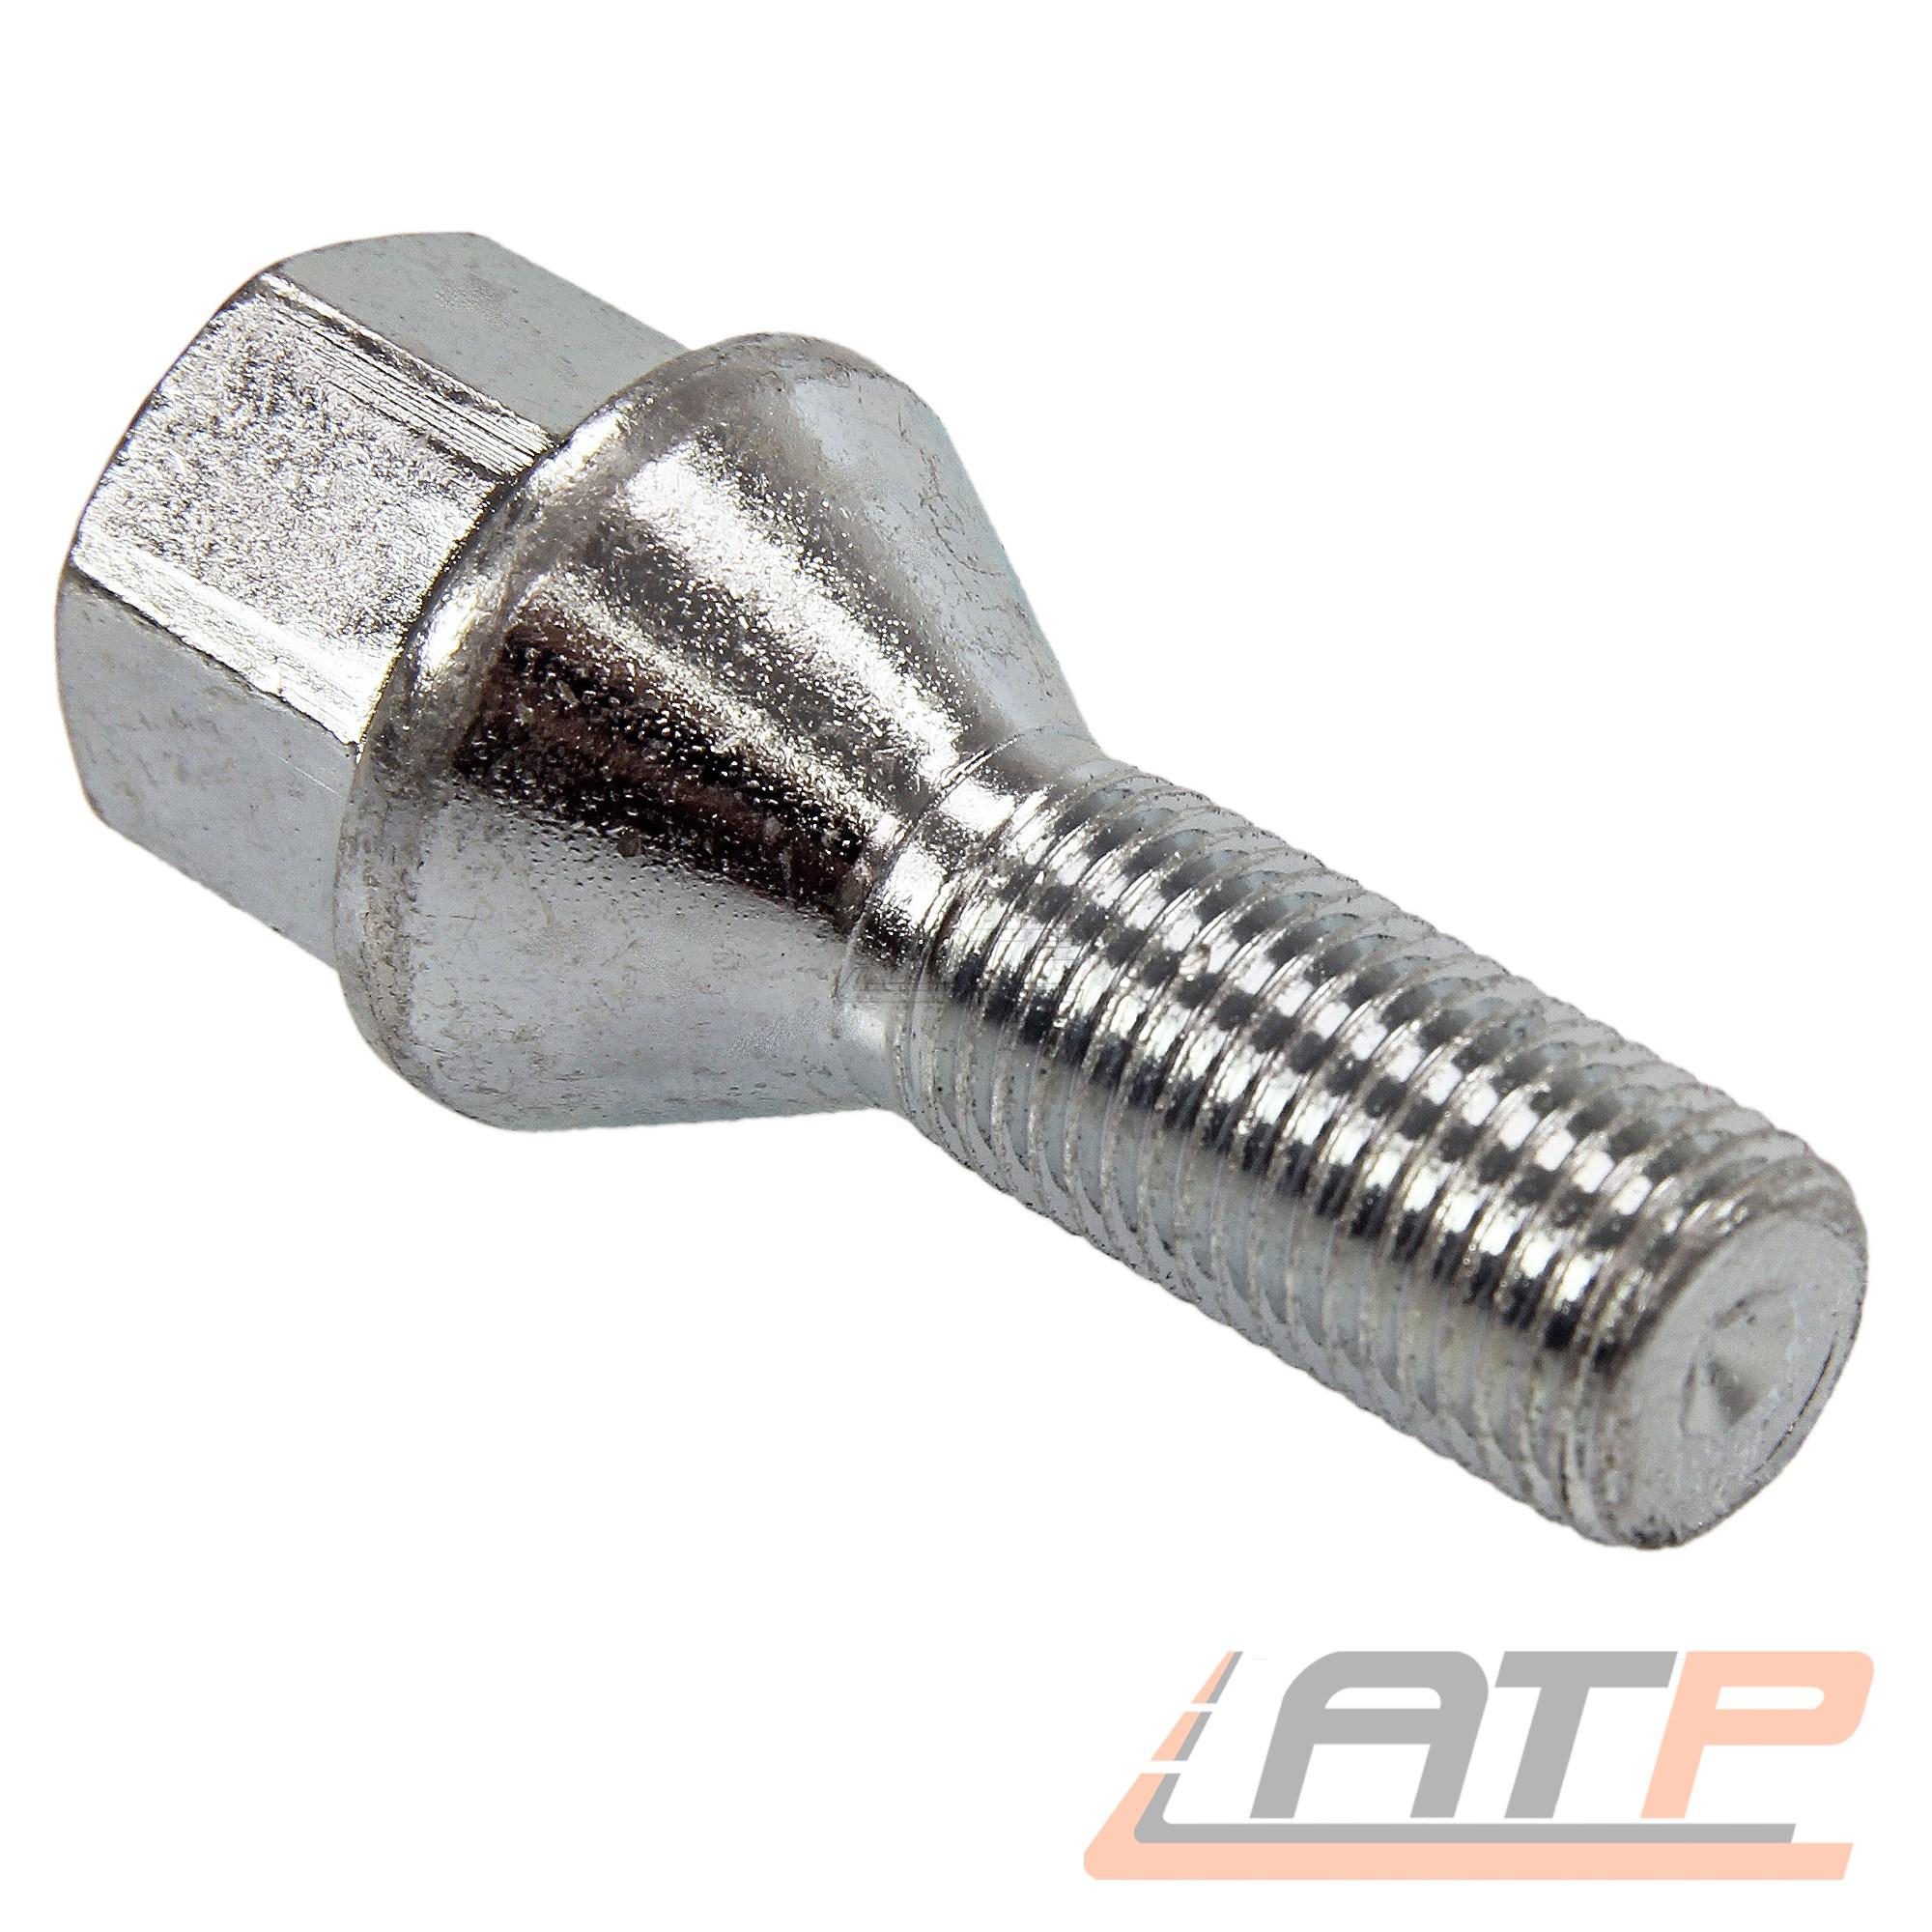 Perno de rueda 16x m12 x 1,5 x 30 mm kegelbund 60 ° sw17 tornillos kegelschraube